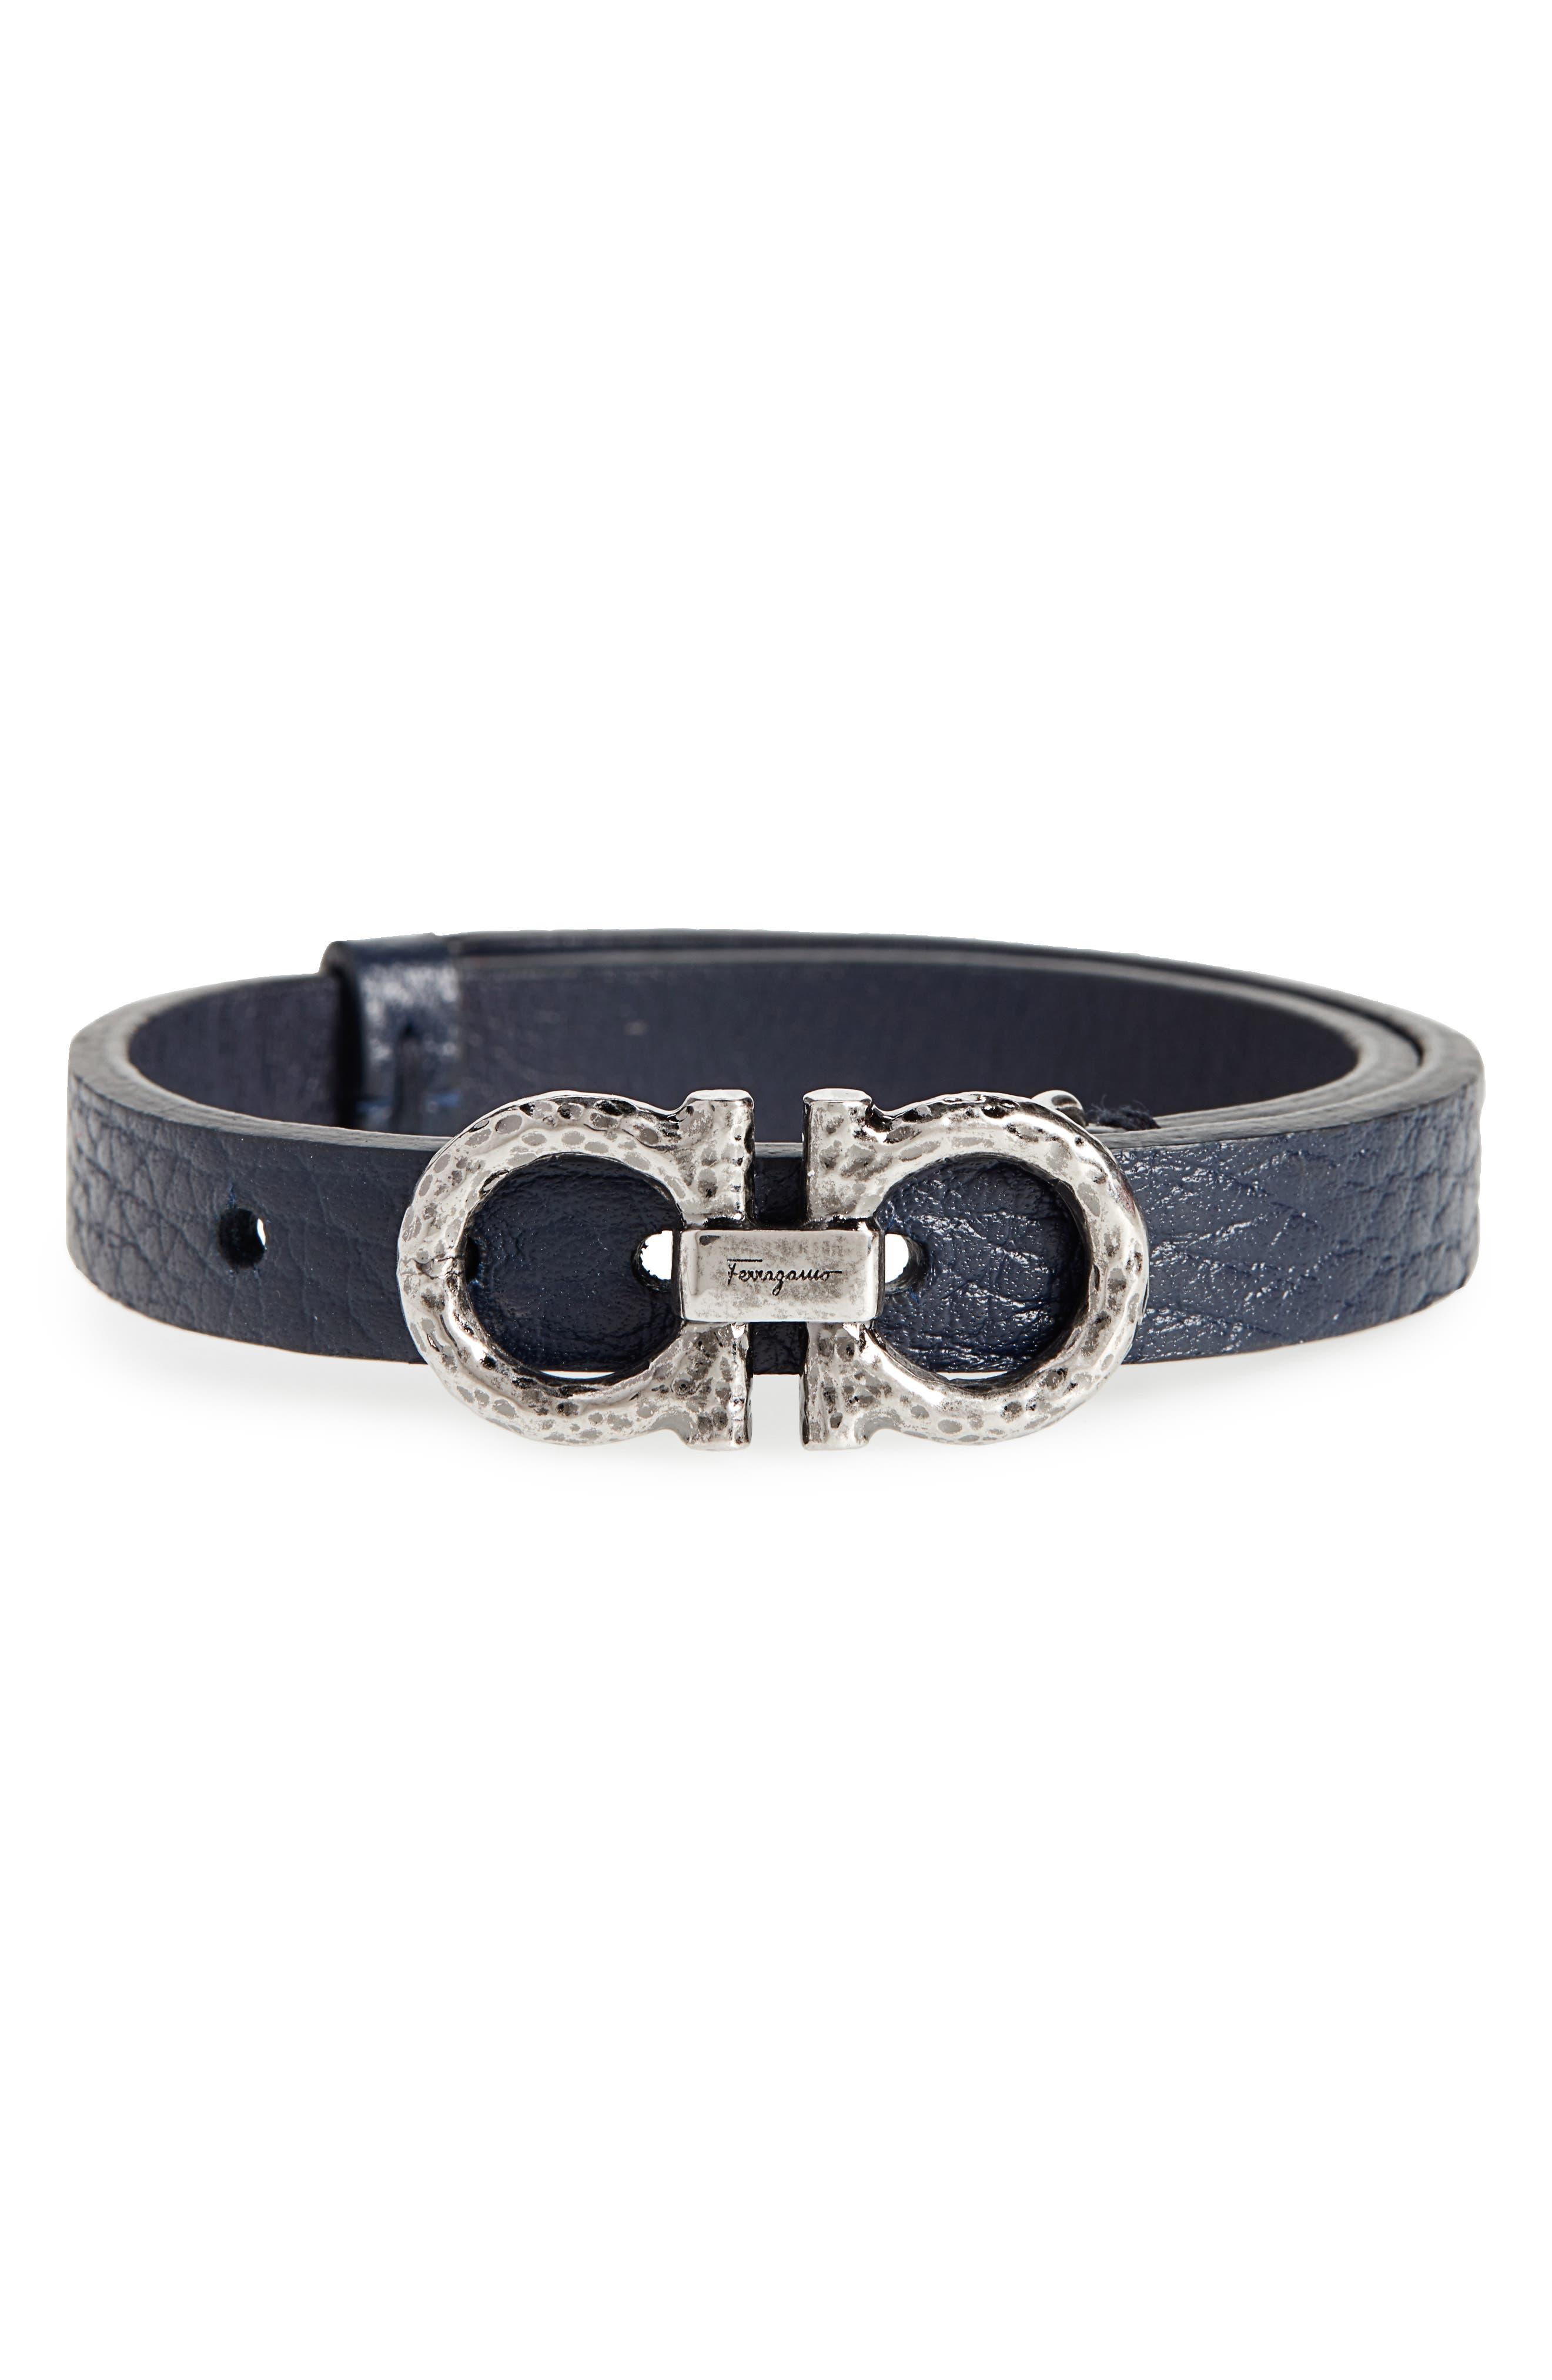 SALVATORE FERRAGAMO Double Gancio Leather Bracelet, Main, color, BLUE MARINE/ SILVER